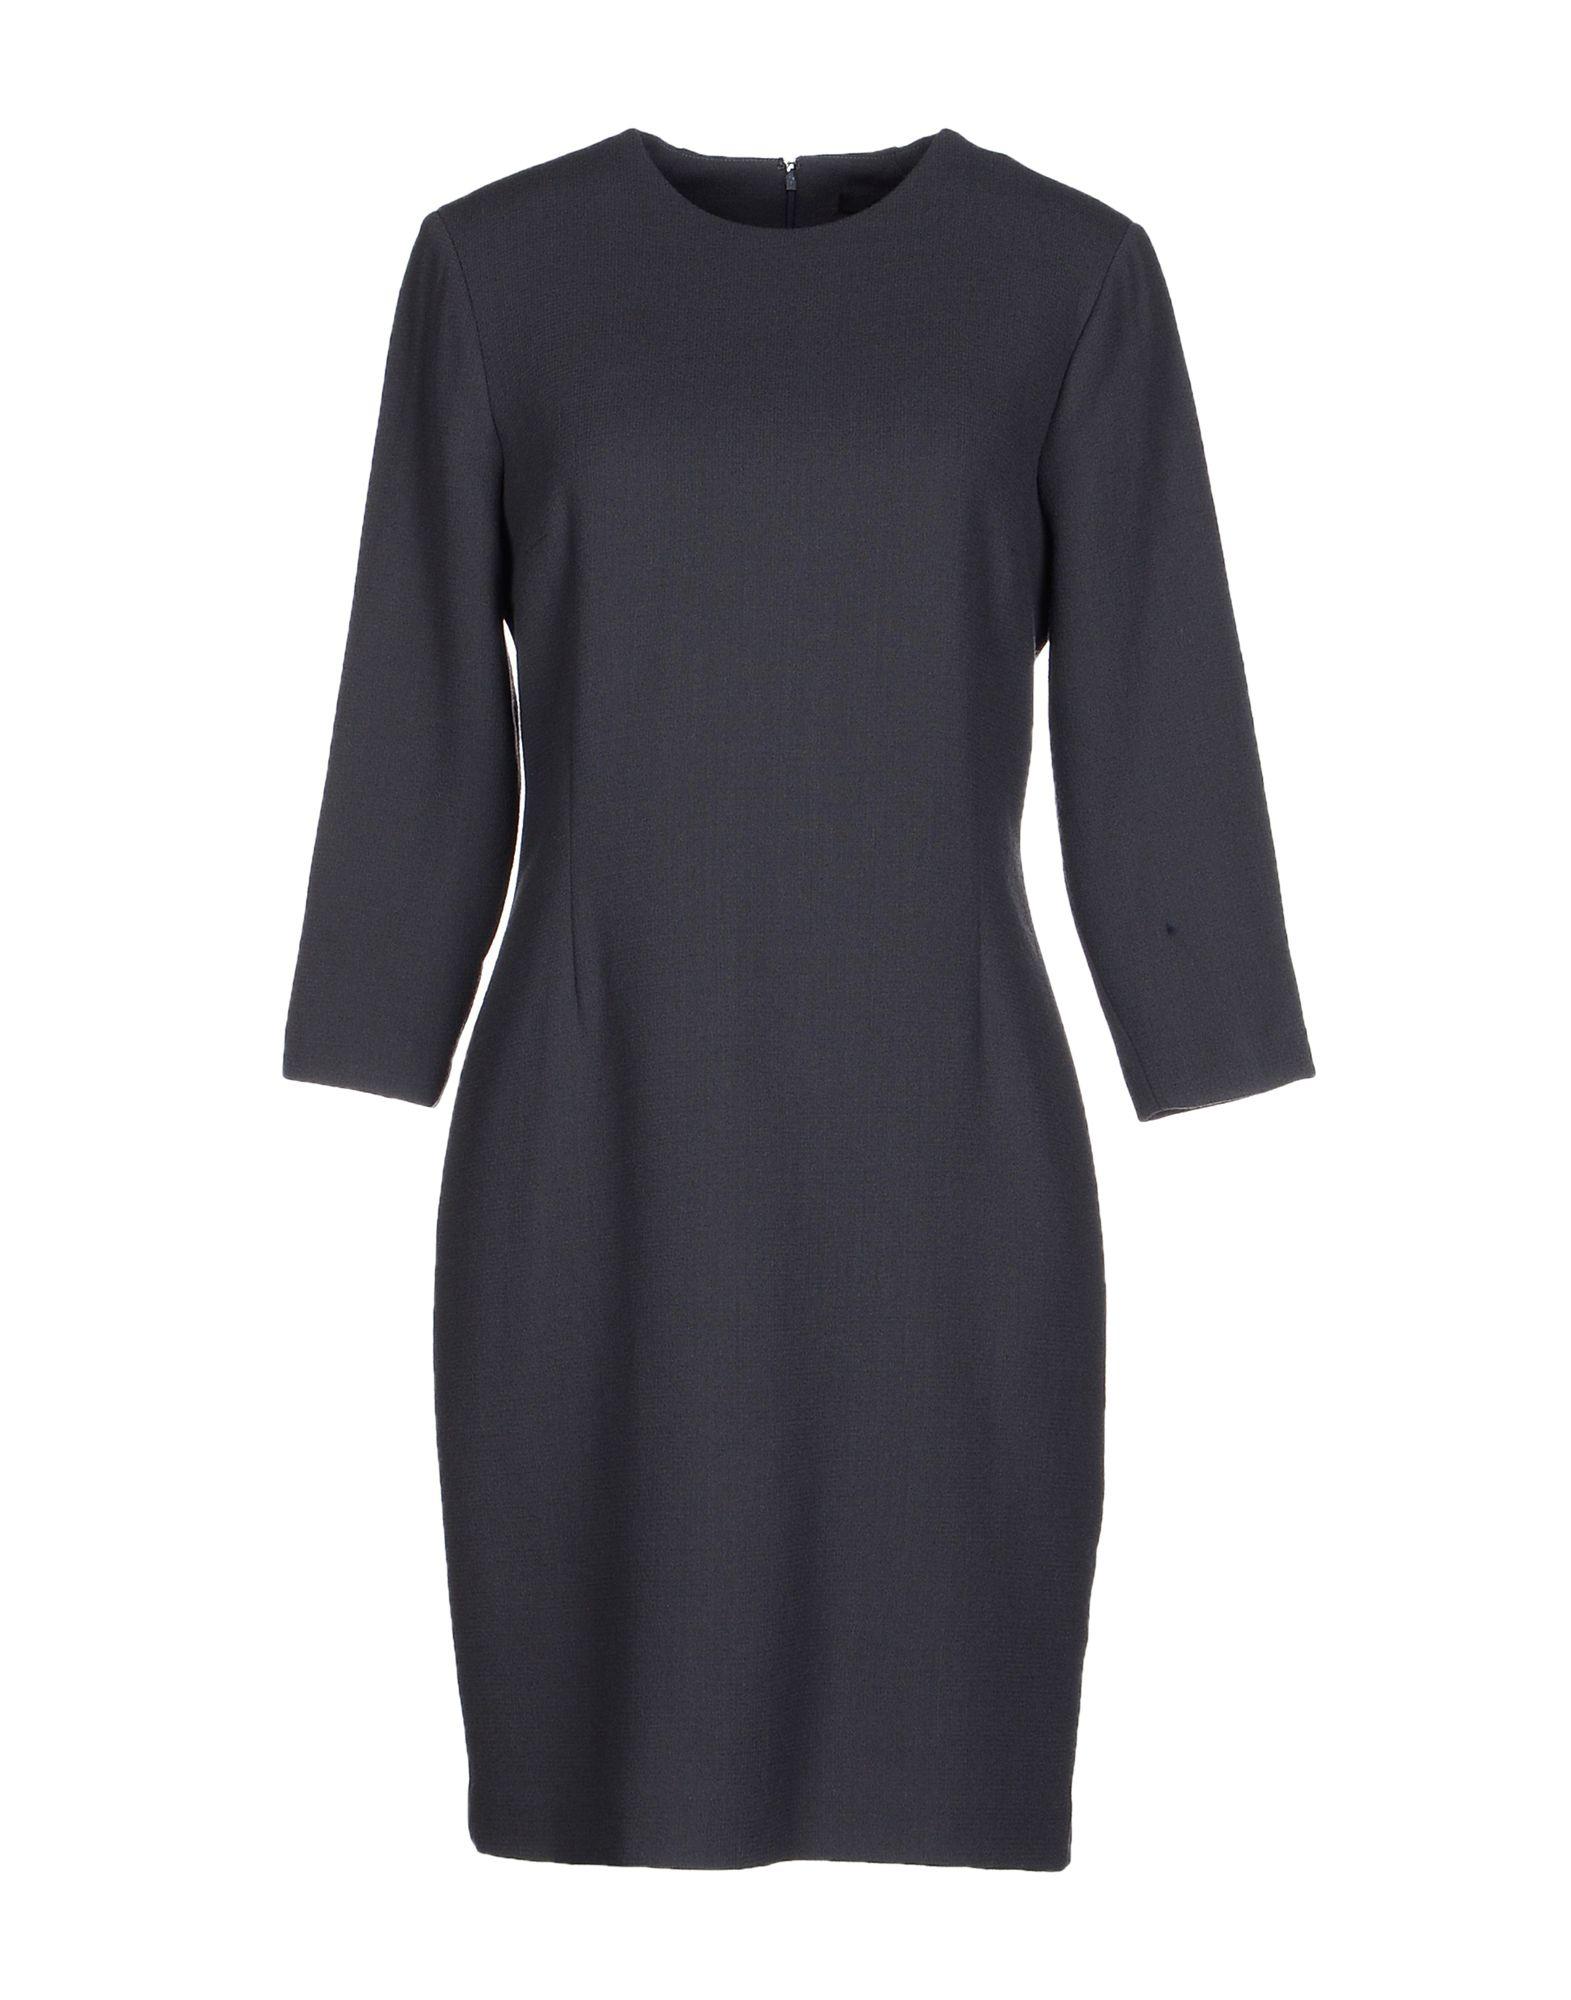 Lyst maurizio pecoraro short dress in gray for Maurizio pecoraro shop on line